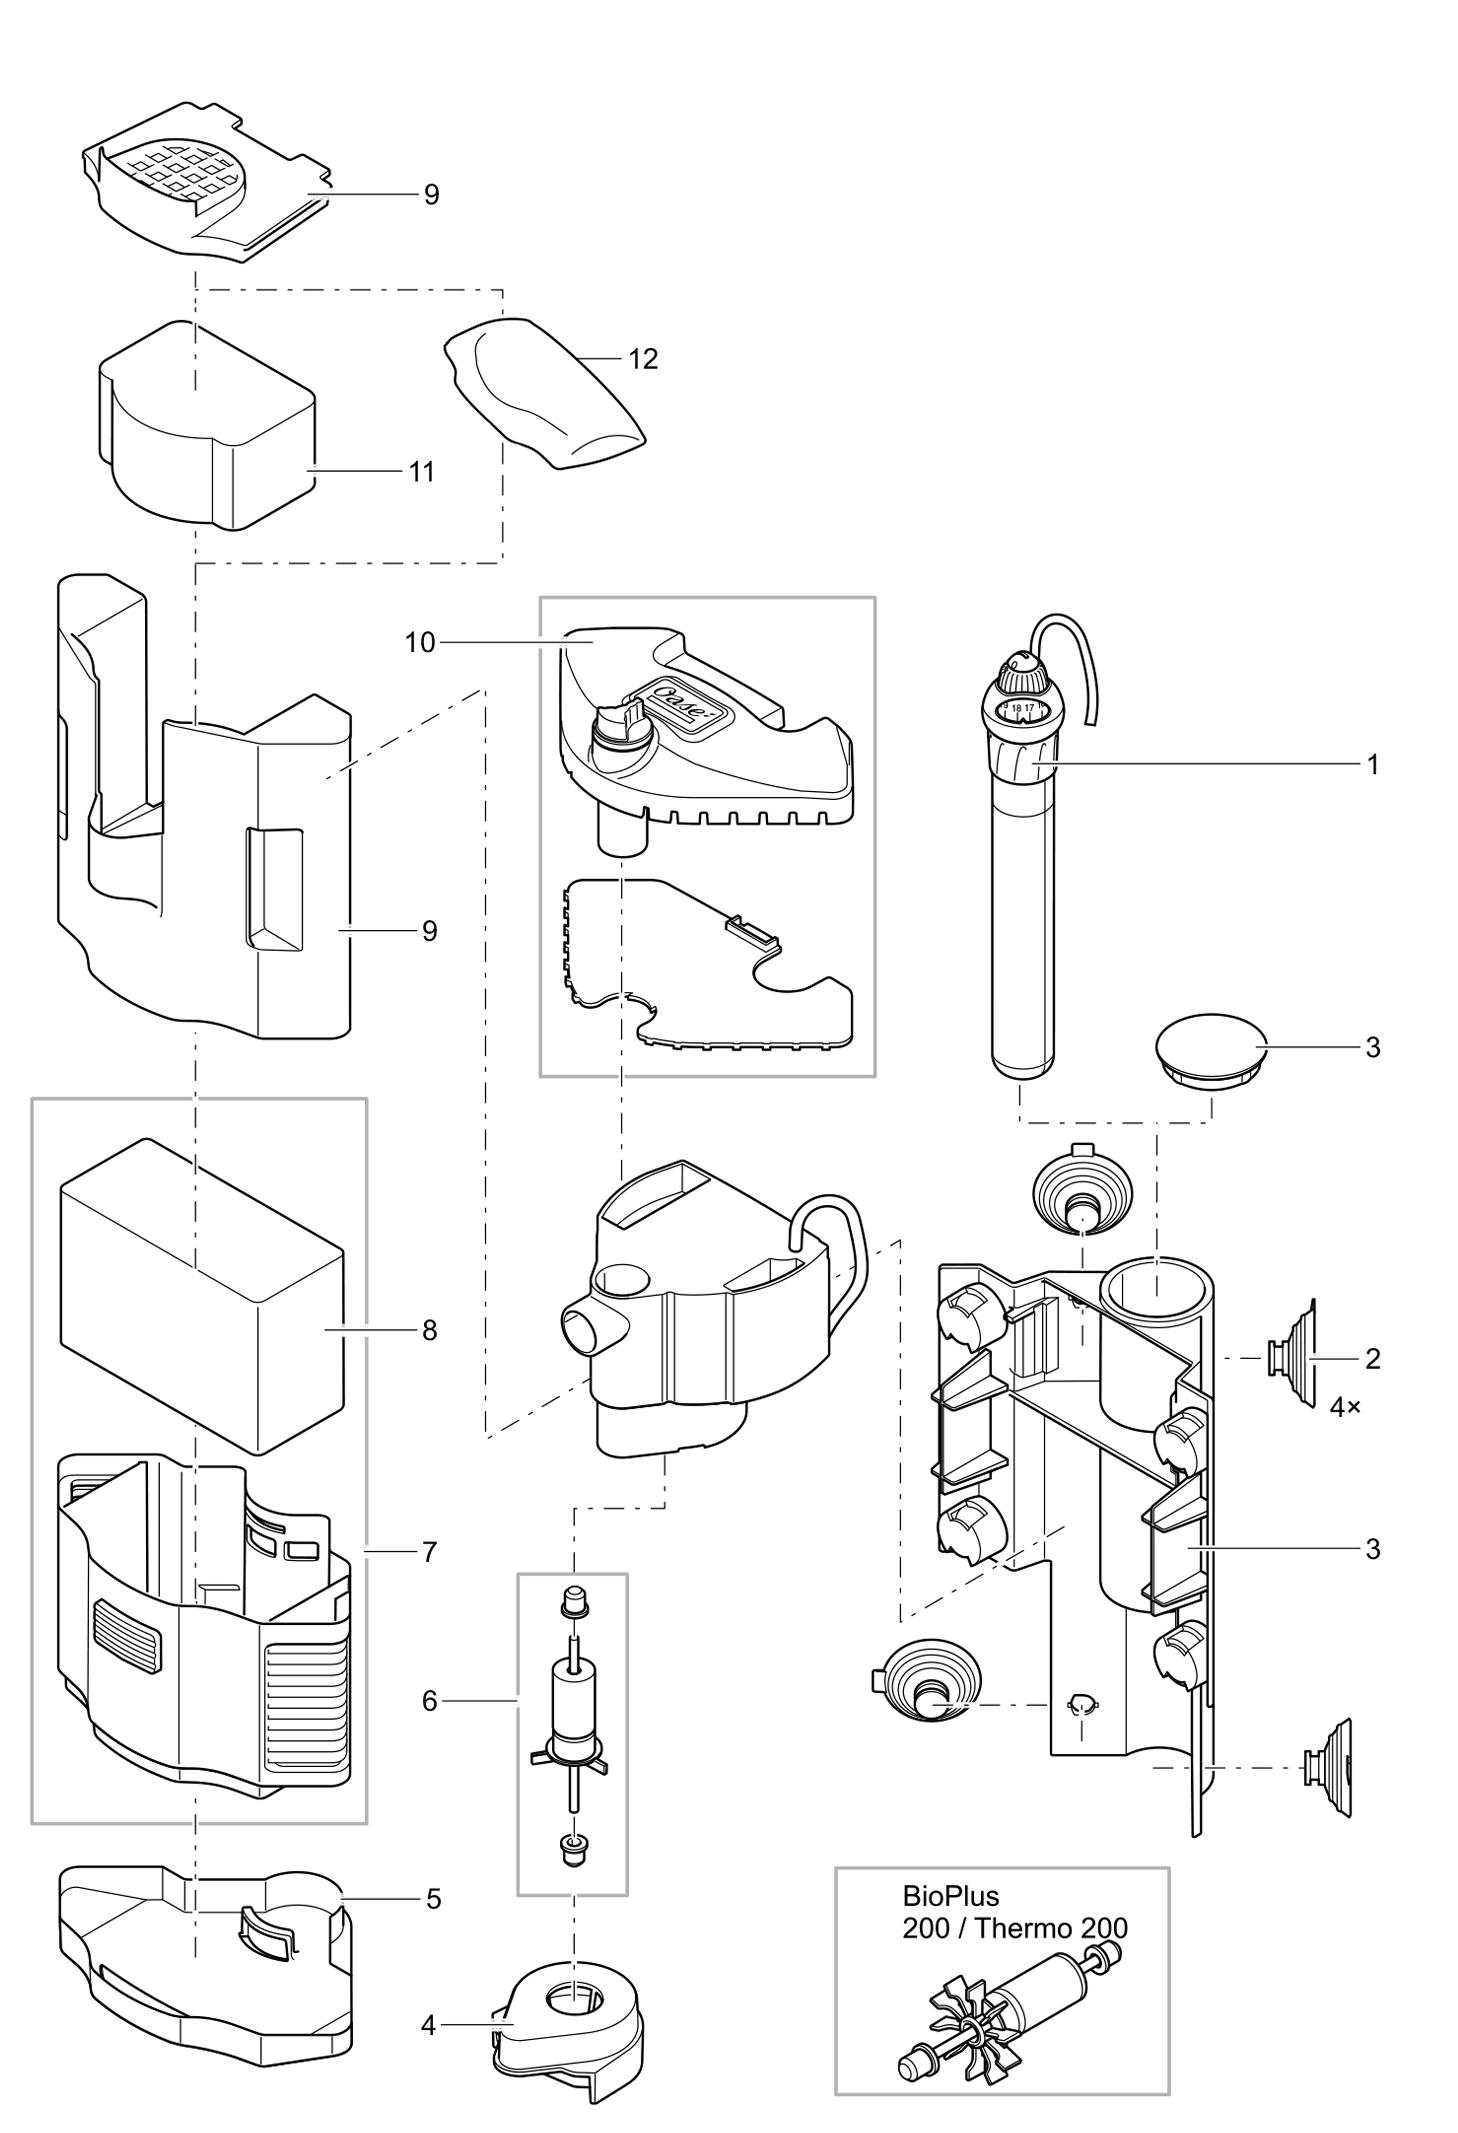 BioPlus thermo 200.jpg